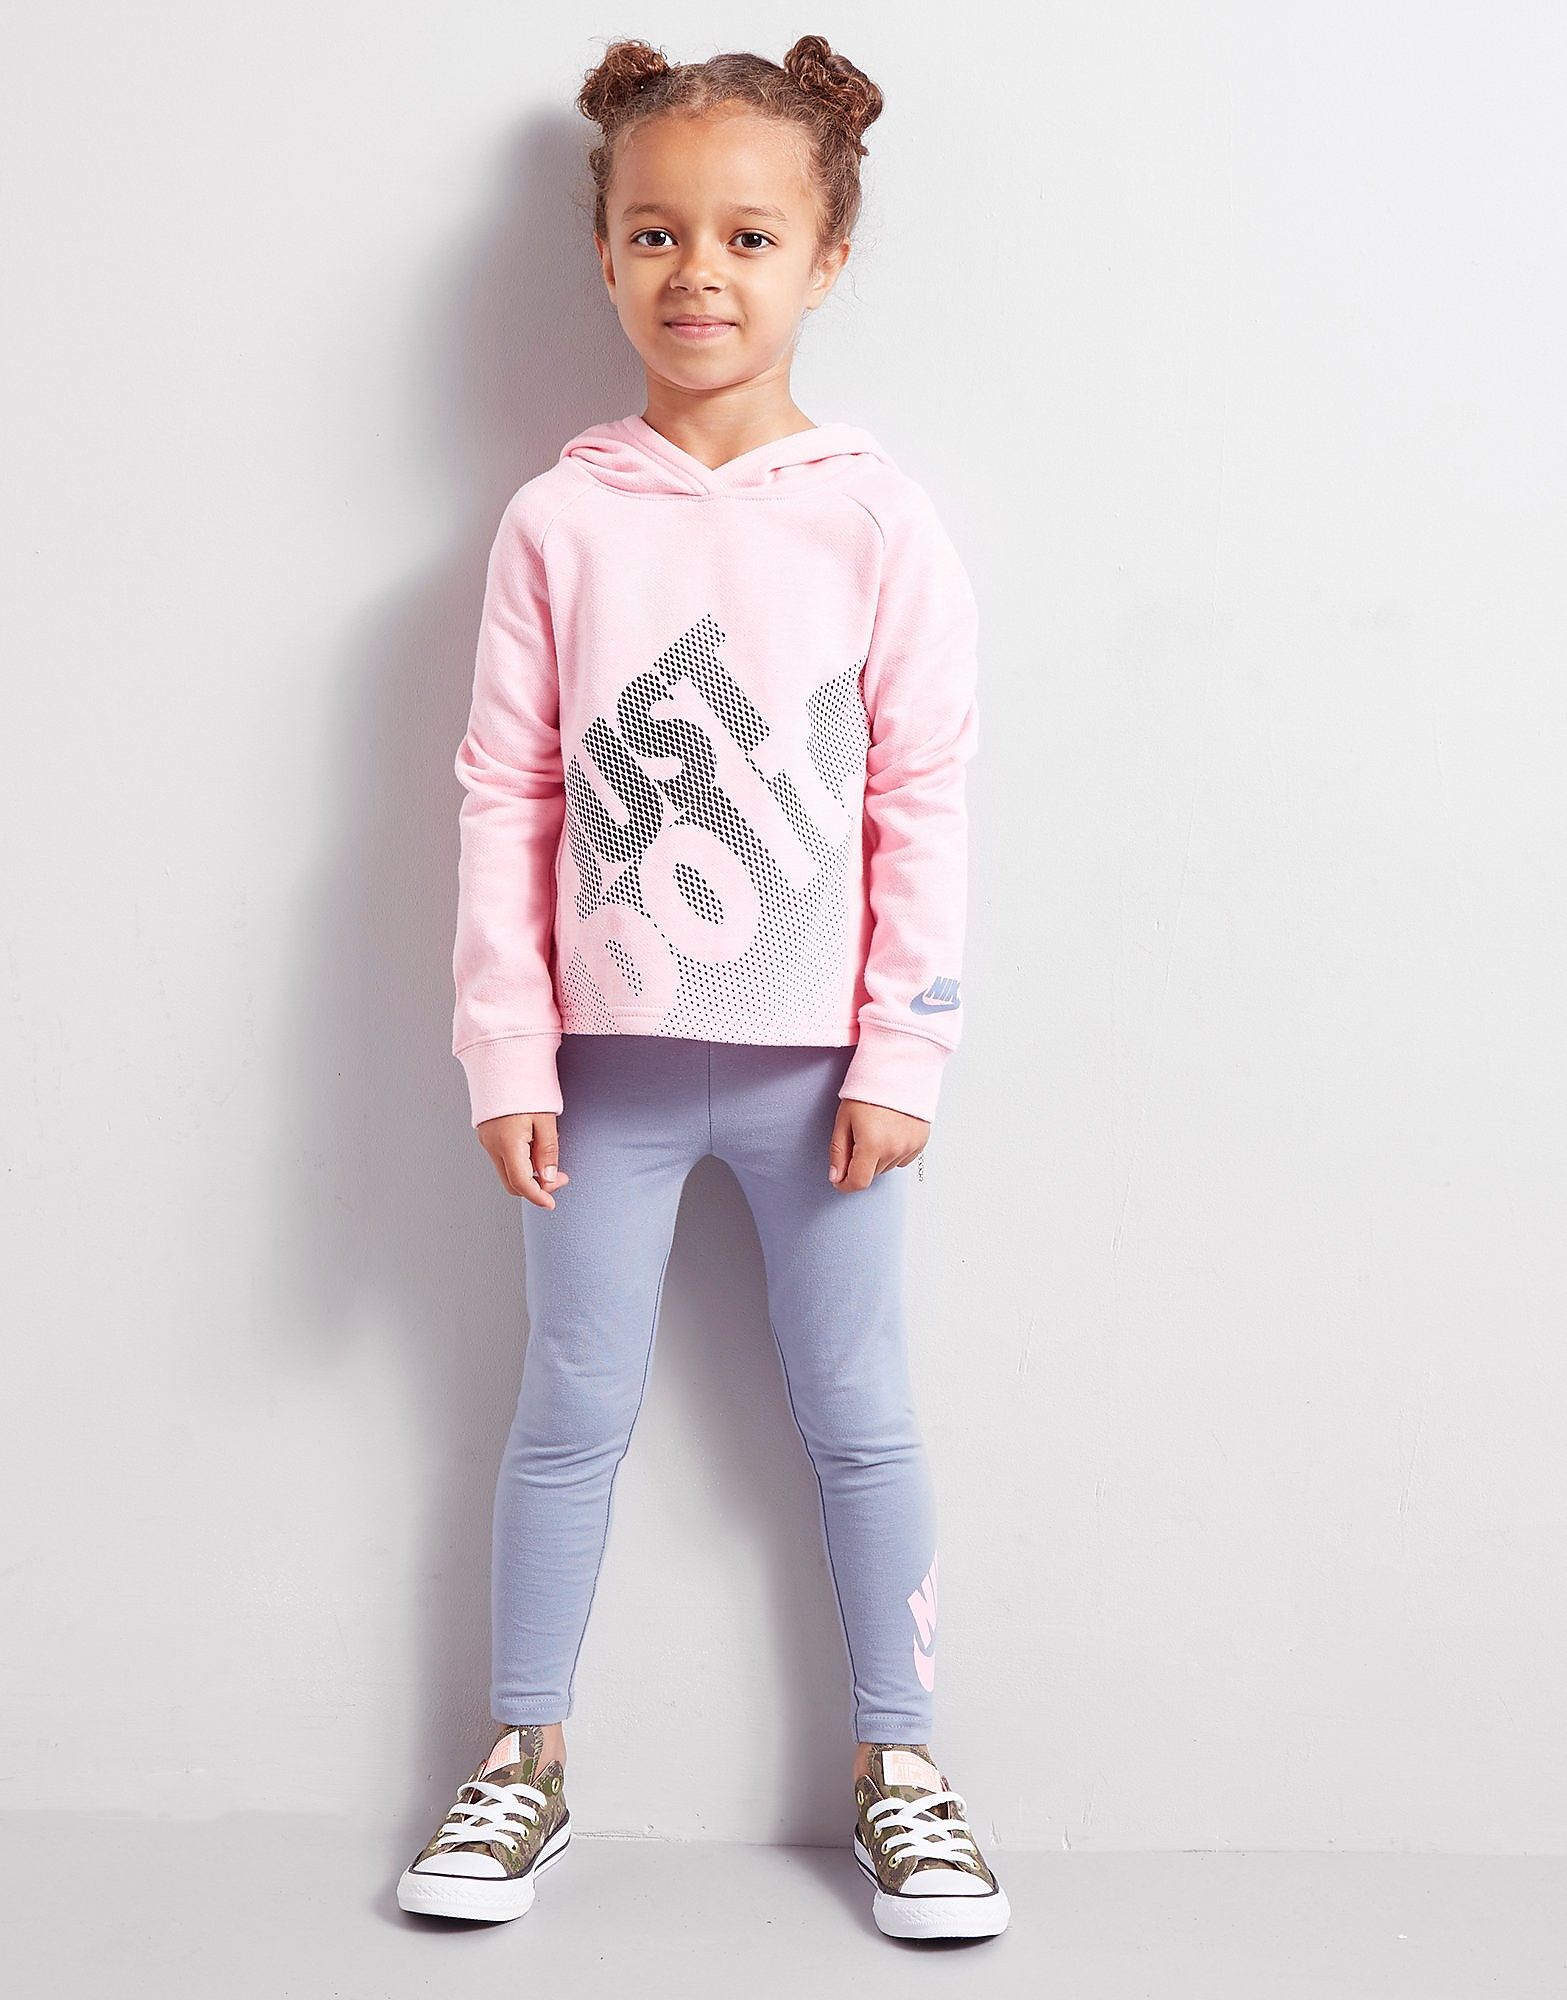 Nike Girls' Just Do It Hoodie/Leggings Set Kinderen - Roze - Kind